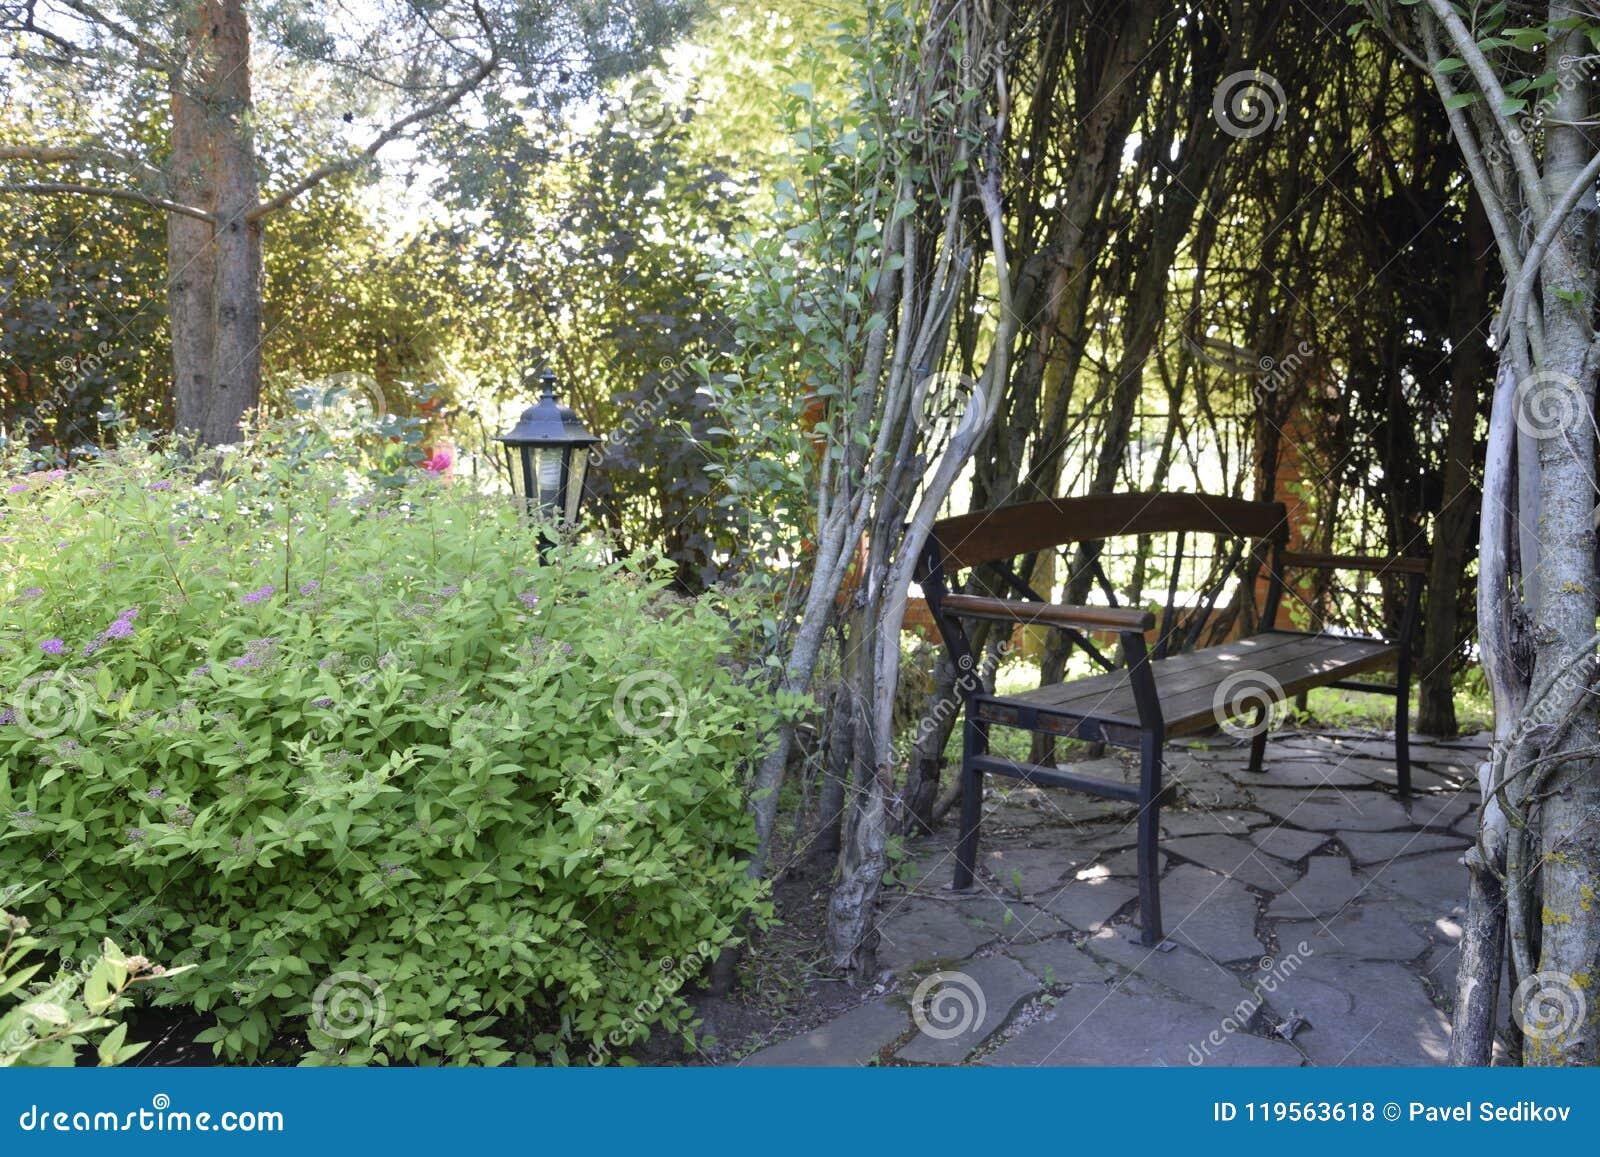 Heavy Duty Counter Stools, Garden Bench In The Shade Stock Photo Image Of Garden 119563618